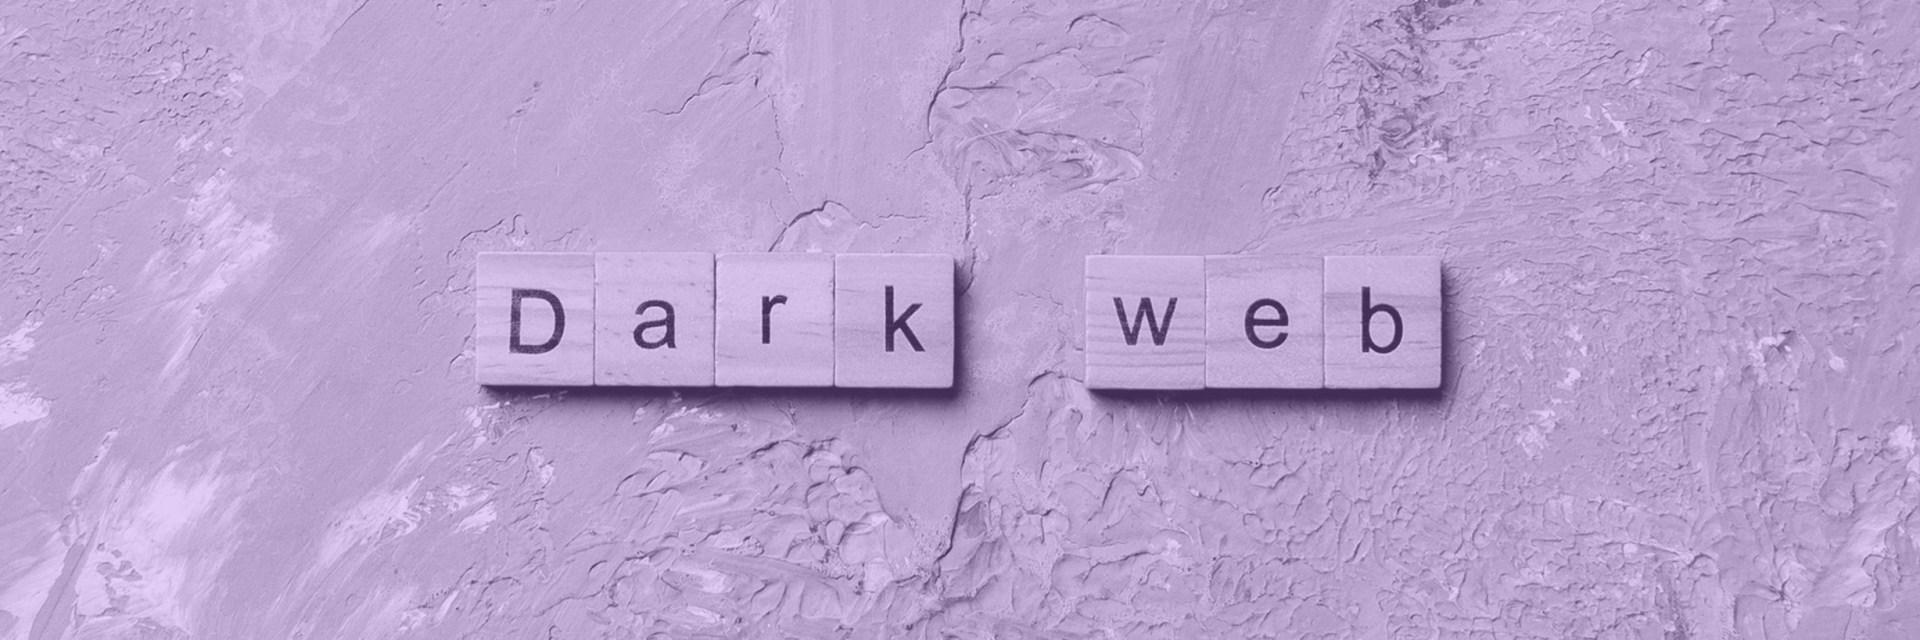 Threat Hunting on Dark Web